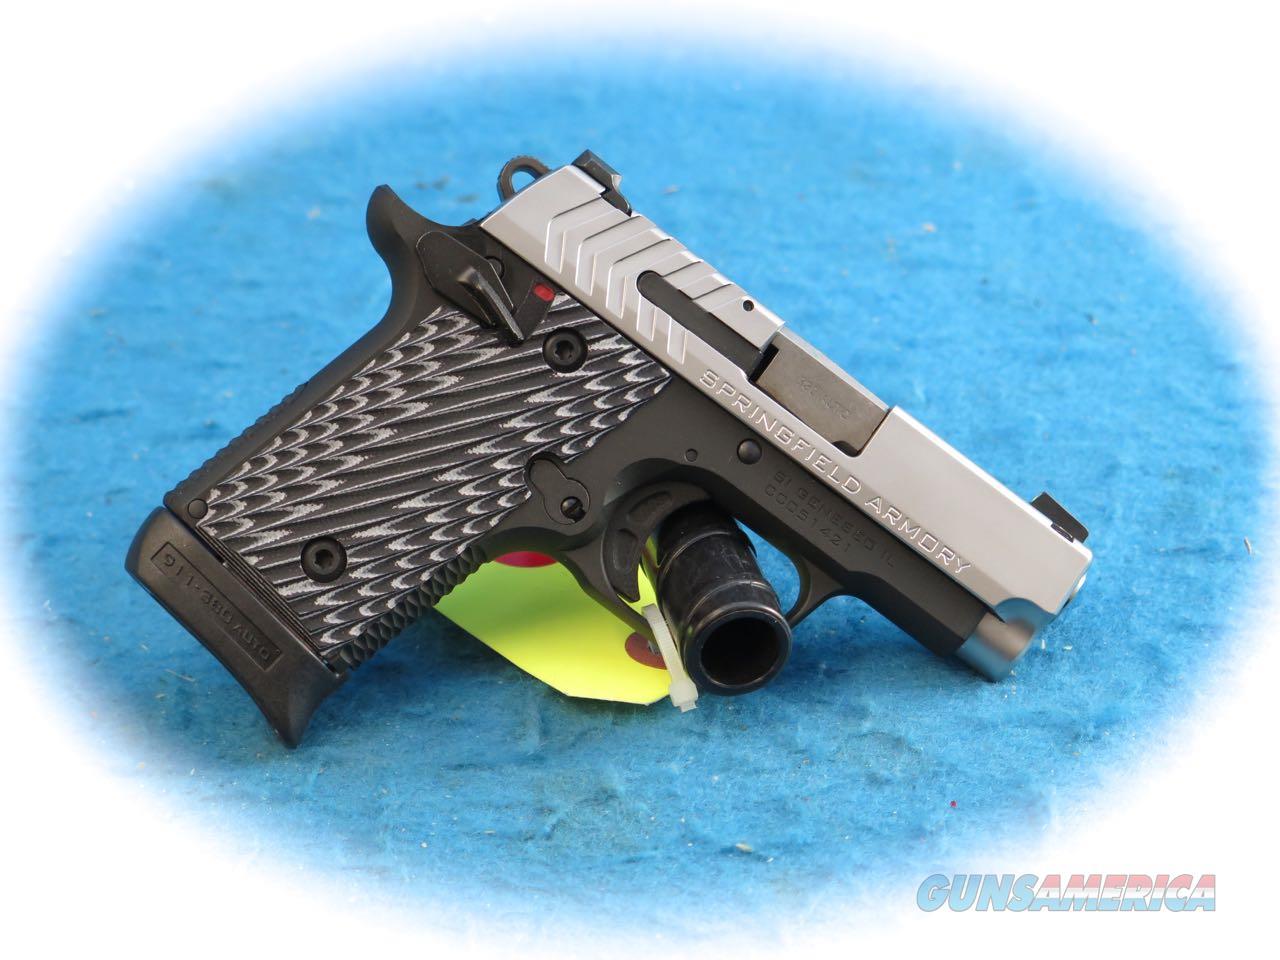 Springfield Armory 911 .380 ACP Pistol Model PG9109S **New**  Guns > Pistols > Springfield Armory Pistols > 1911 Type